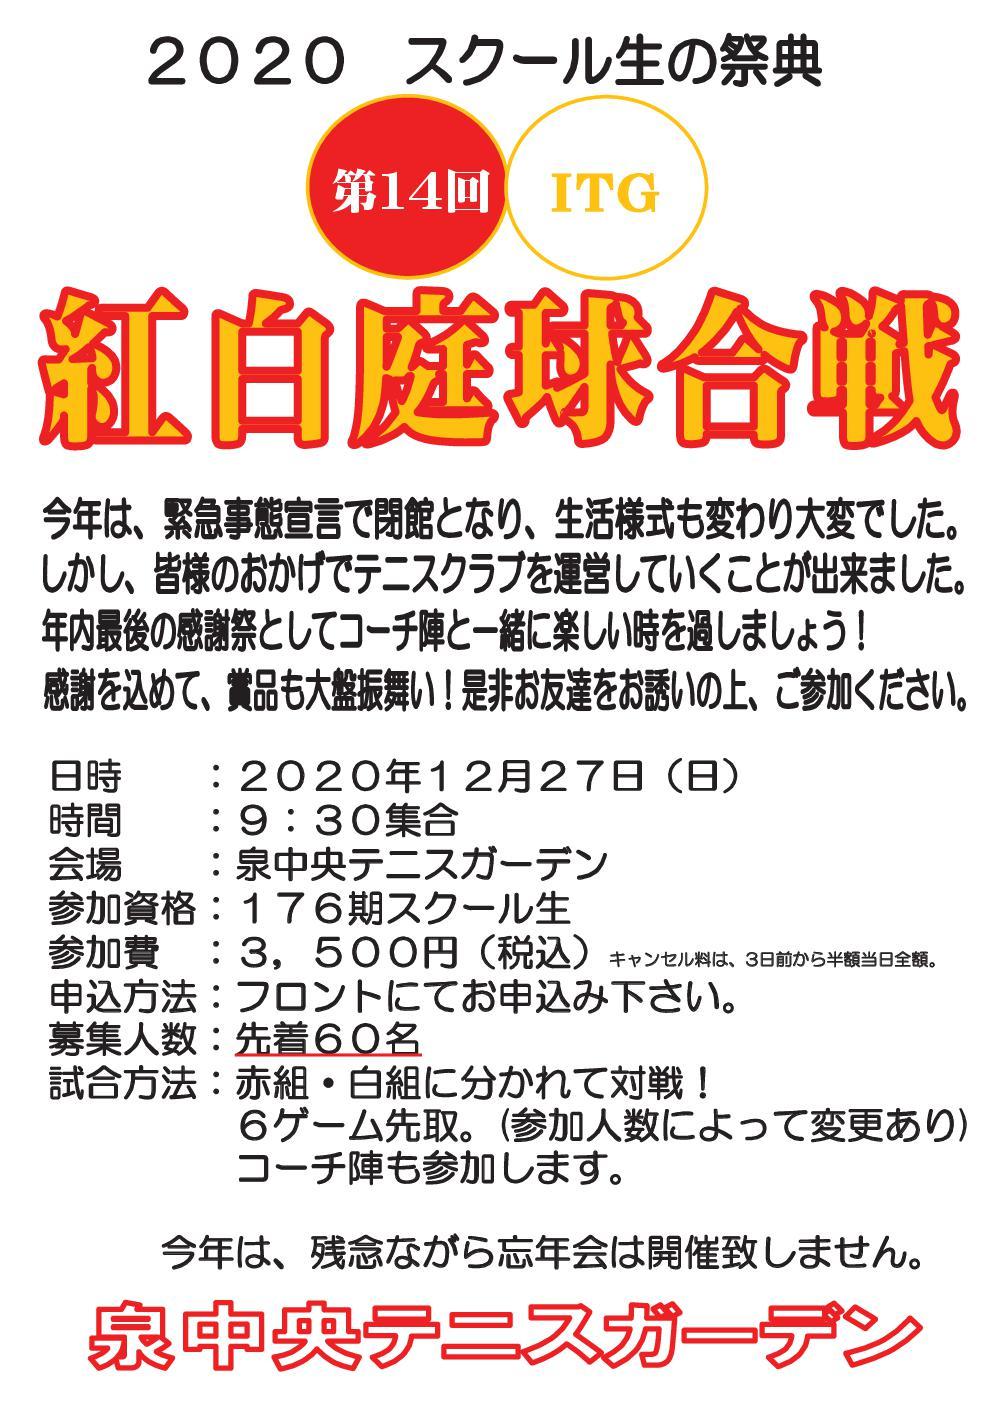 .jpg - 紅白庭球合戦(176期スクール生対象)